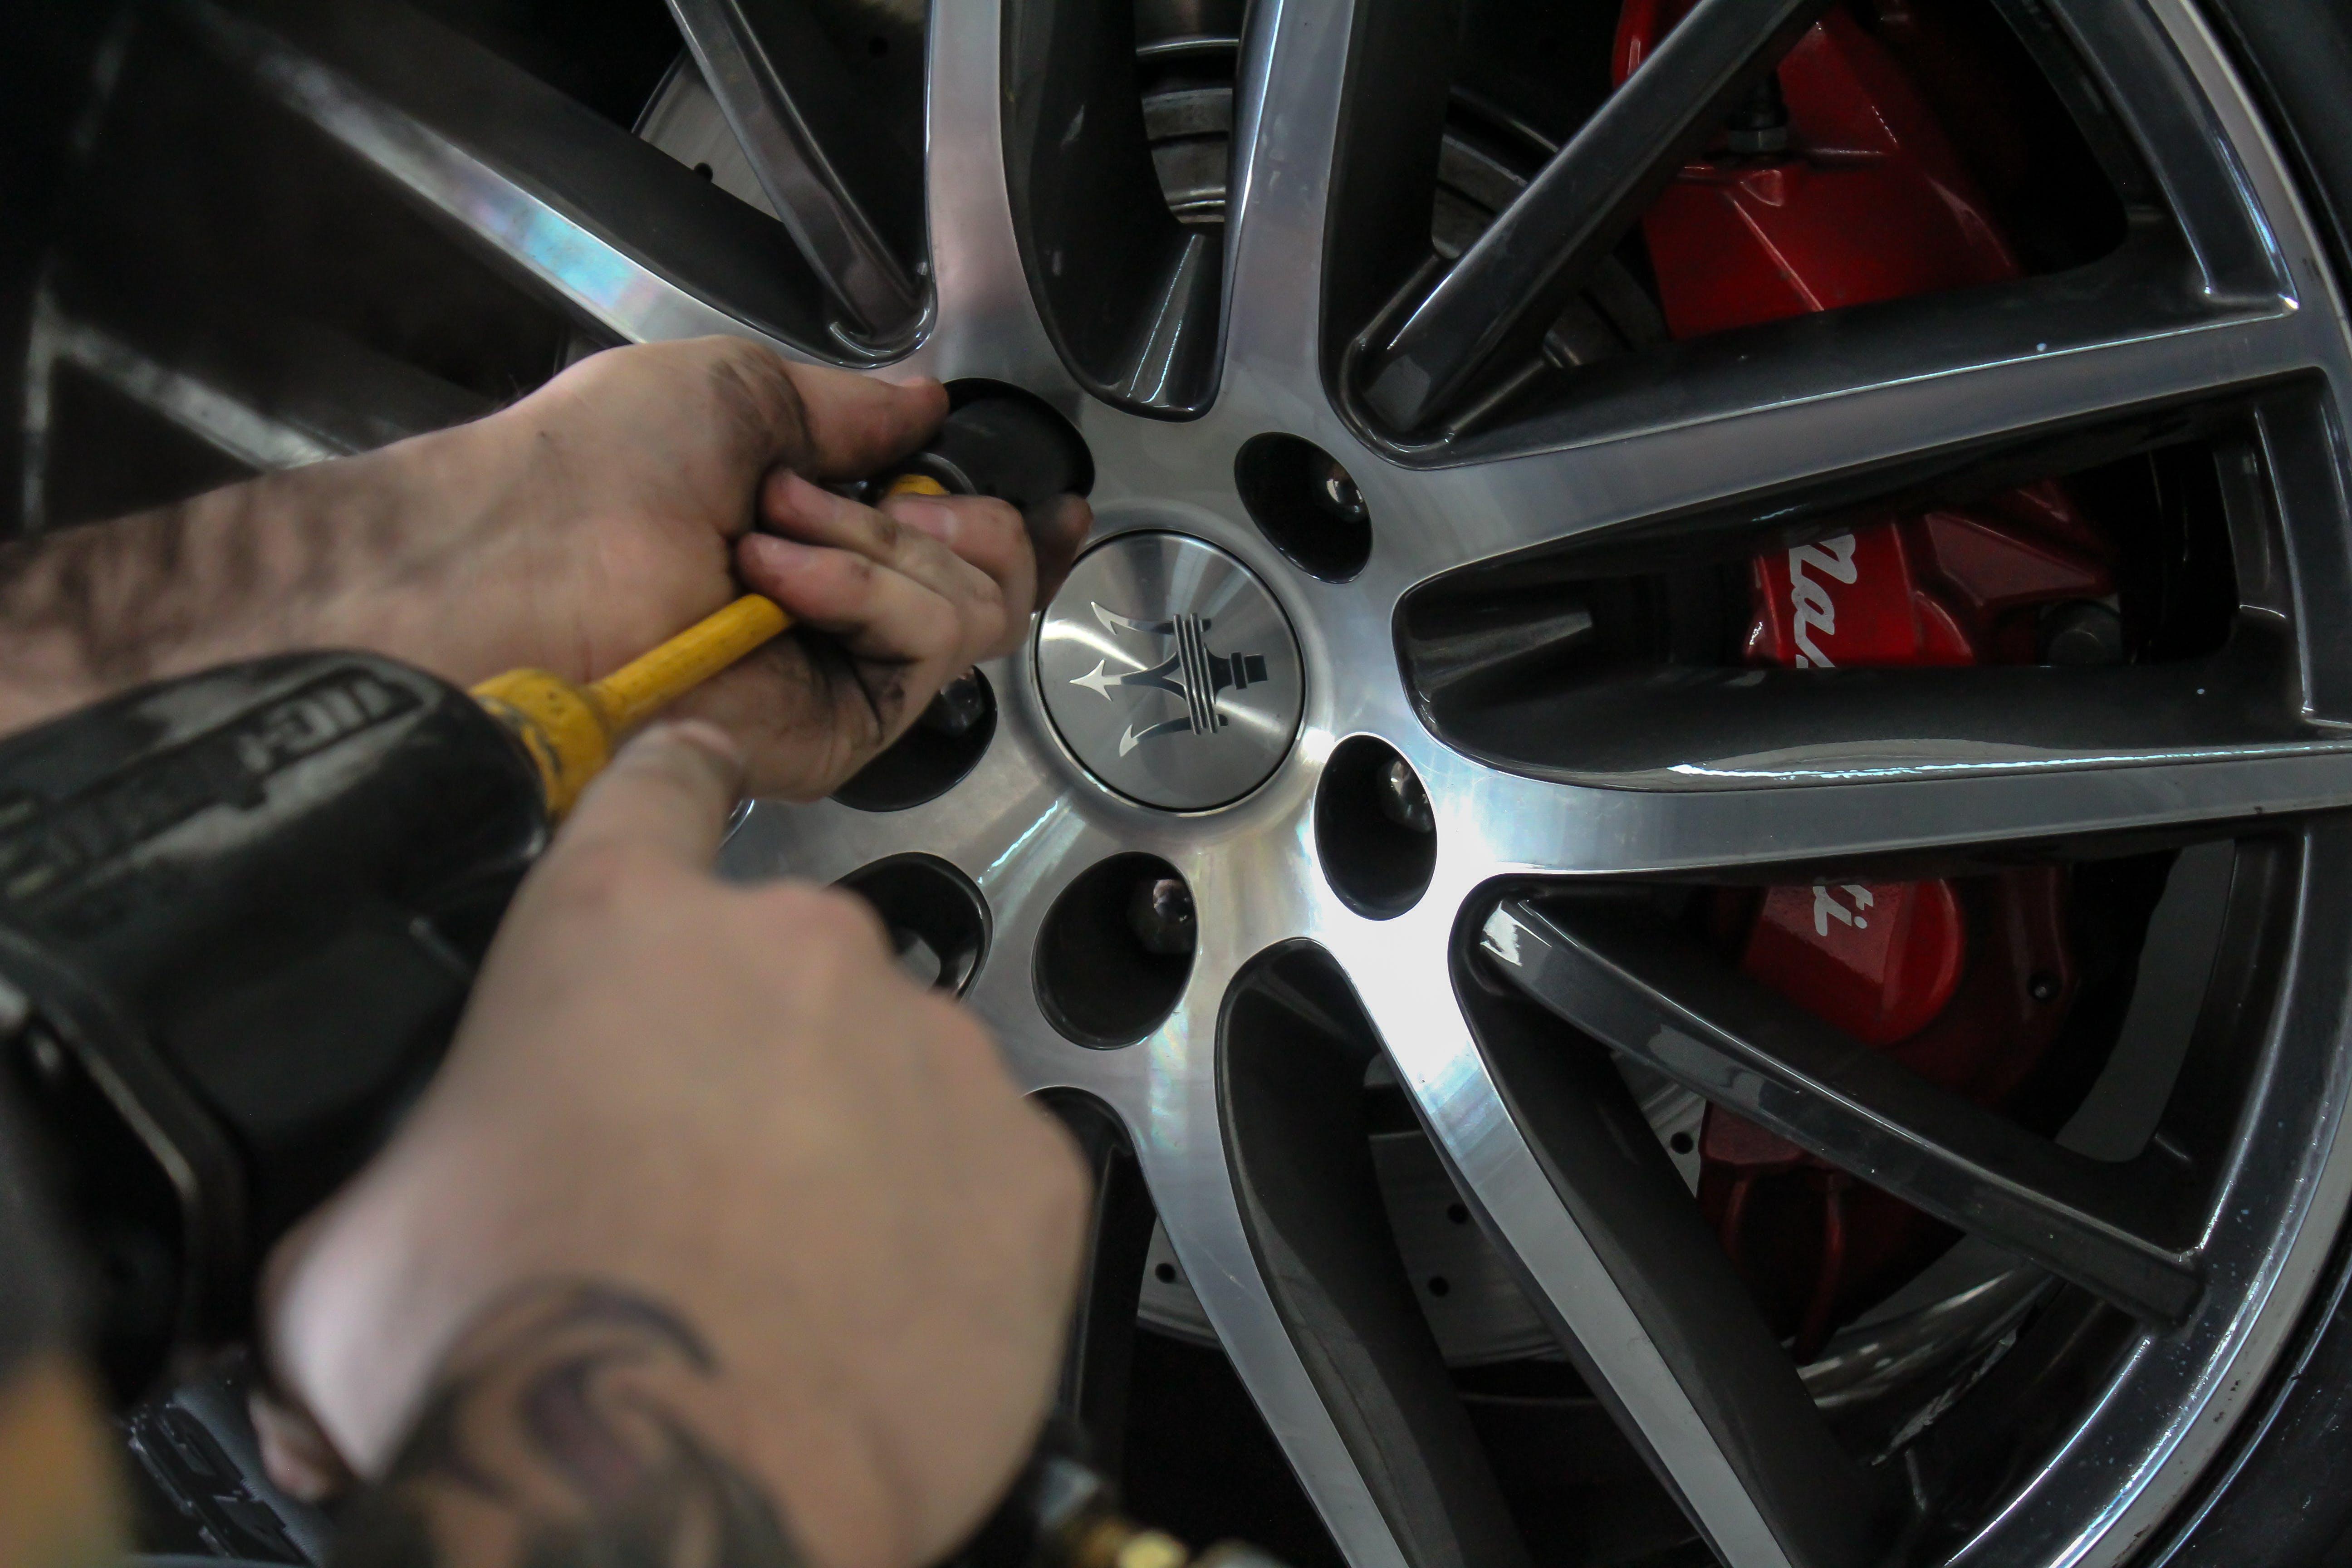 Free stock photo of auto, brake, car repair, power tools